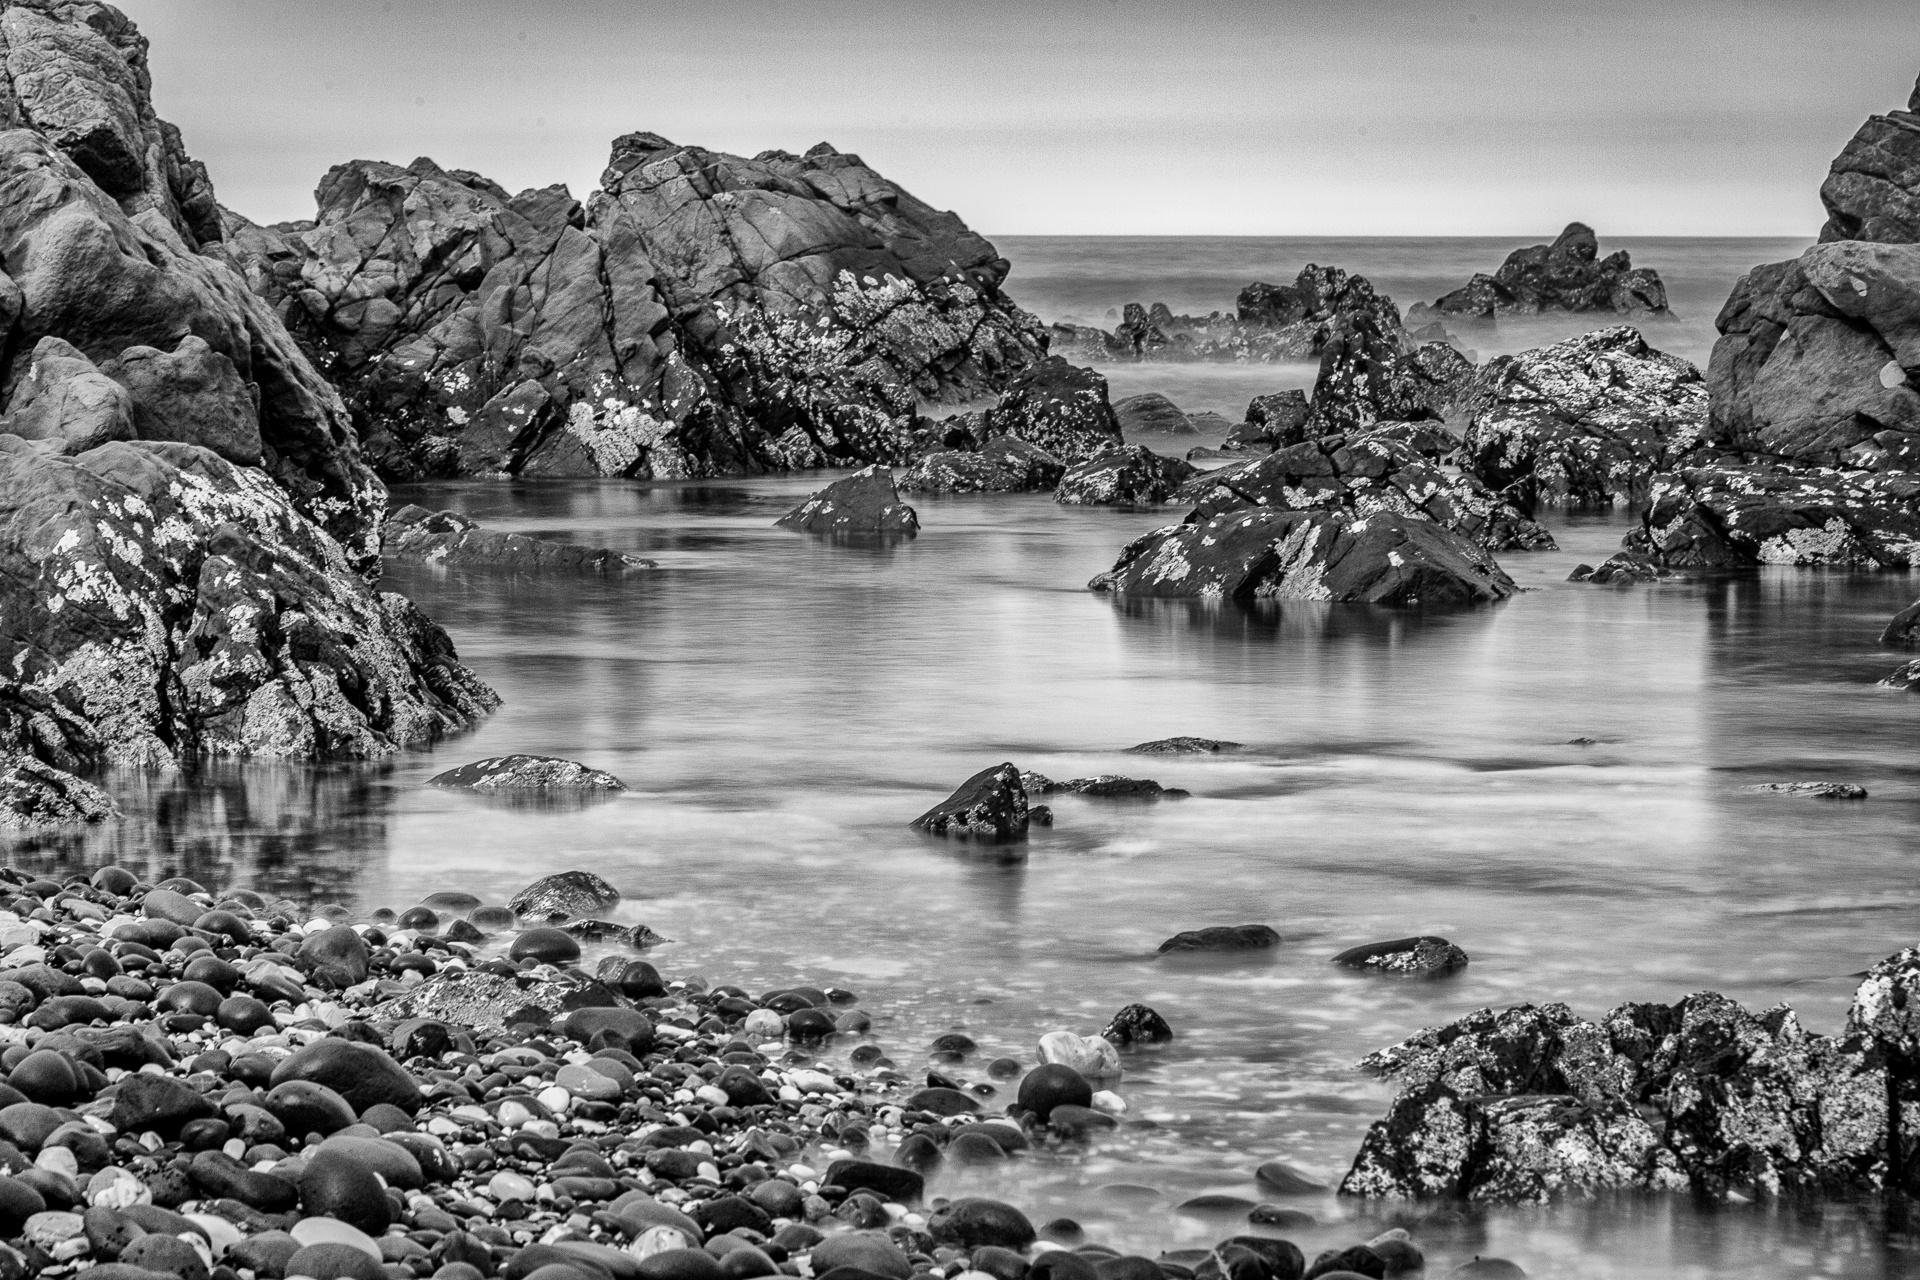 Stillness of a rock pool